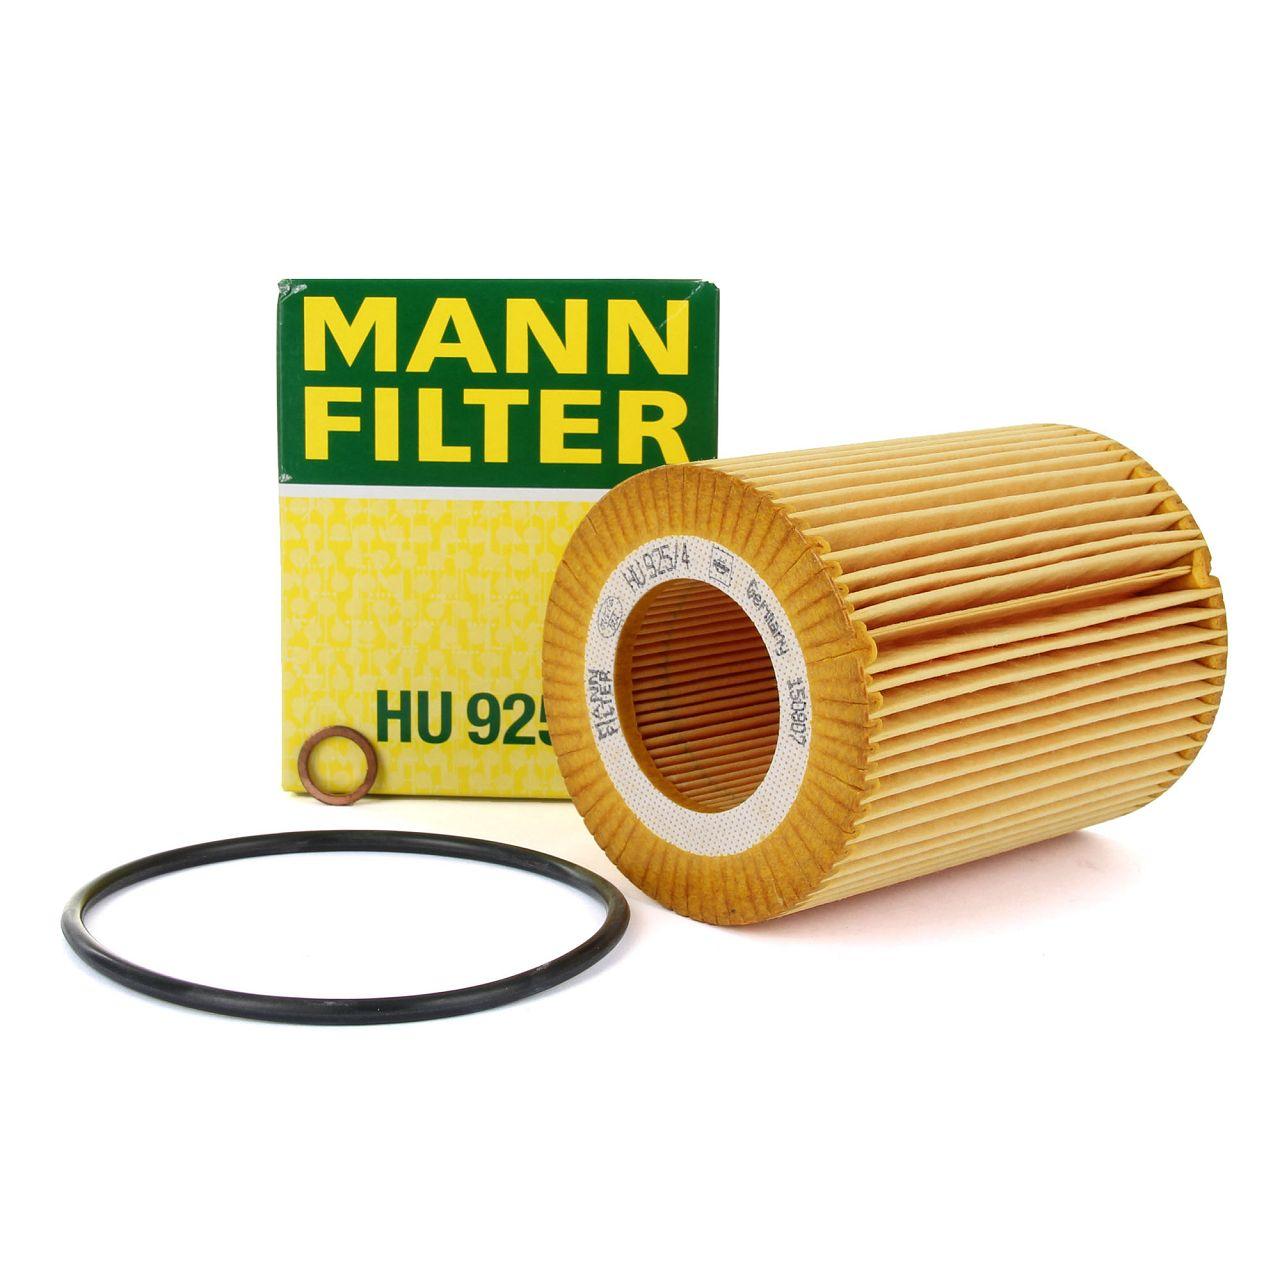 MANN Ölfilter HU925/4x für BMW E36 E46 E90 E60 E61 E38 E65-67 X3 X5 Z3 Z4